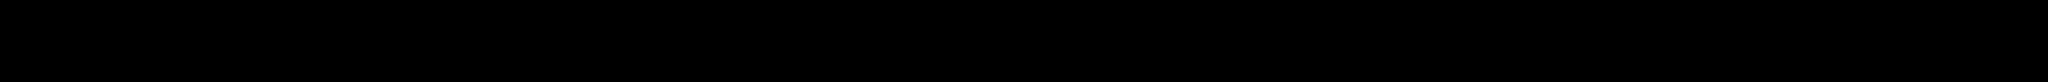 RIDEX 1E0698451, 1E0698451B, 1E0698451D, 1E0698451E, 1E0698451G Zestaw klocków hamulcowych, hamulce tarczowe